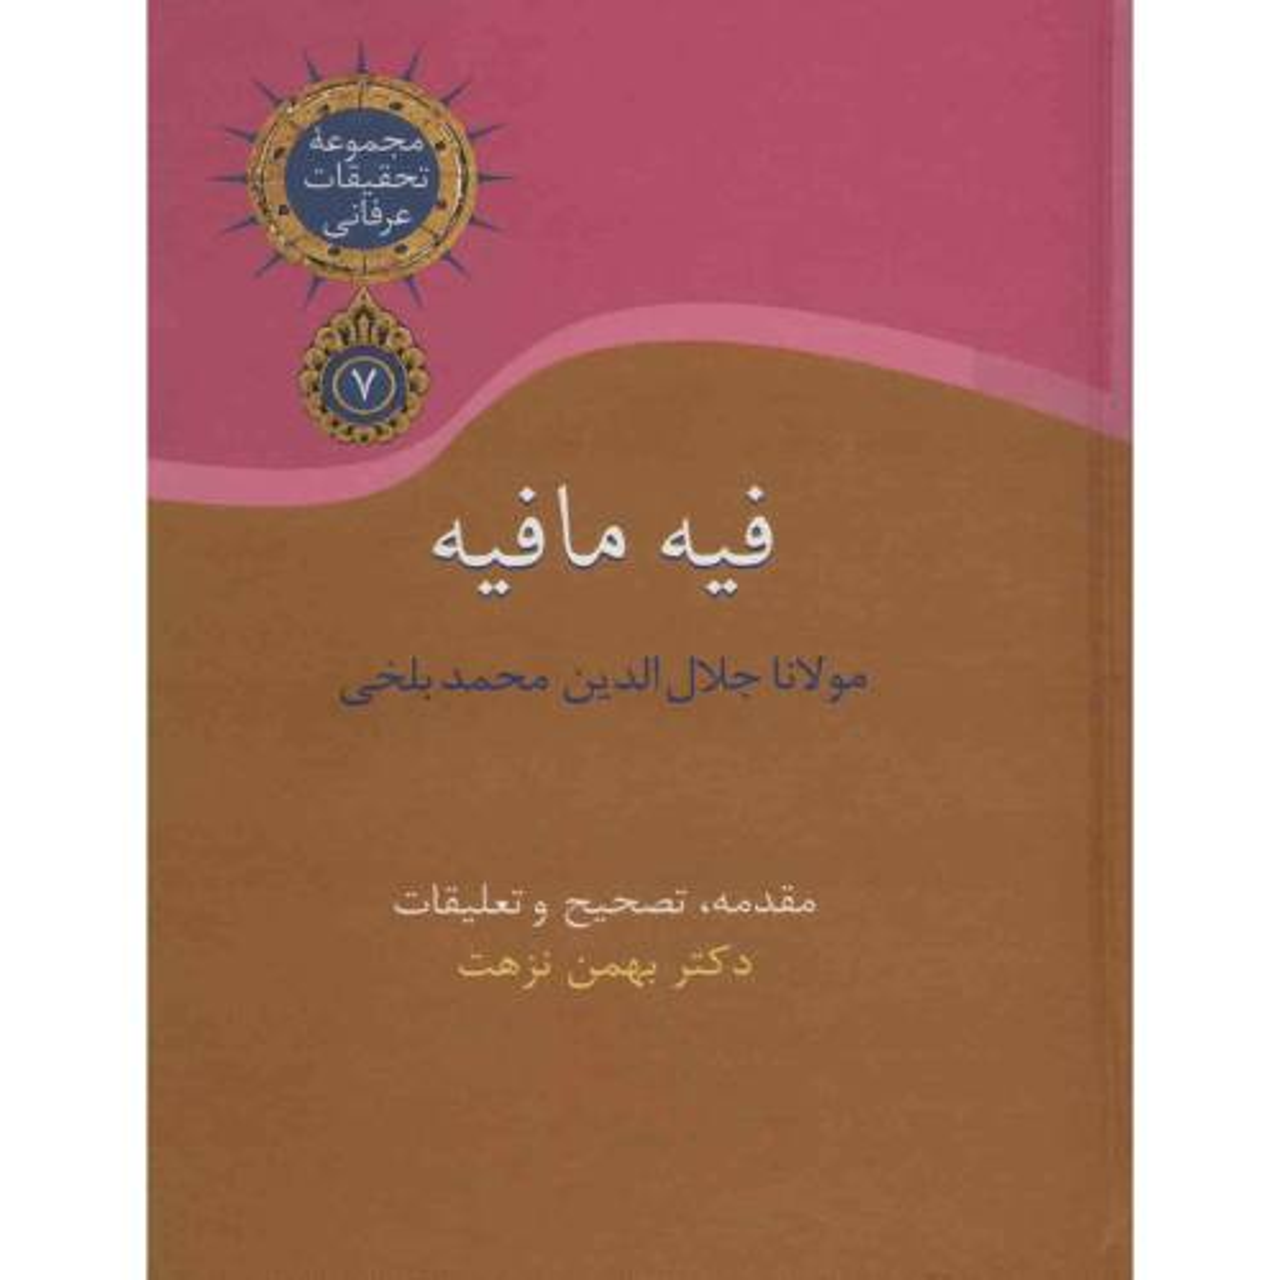 کتاب فیه مافیه اثر مولانا جلال الدین محمد بلخی